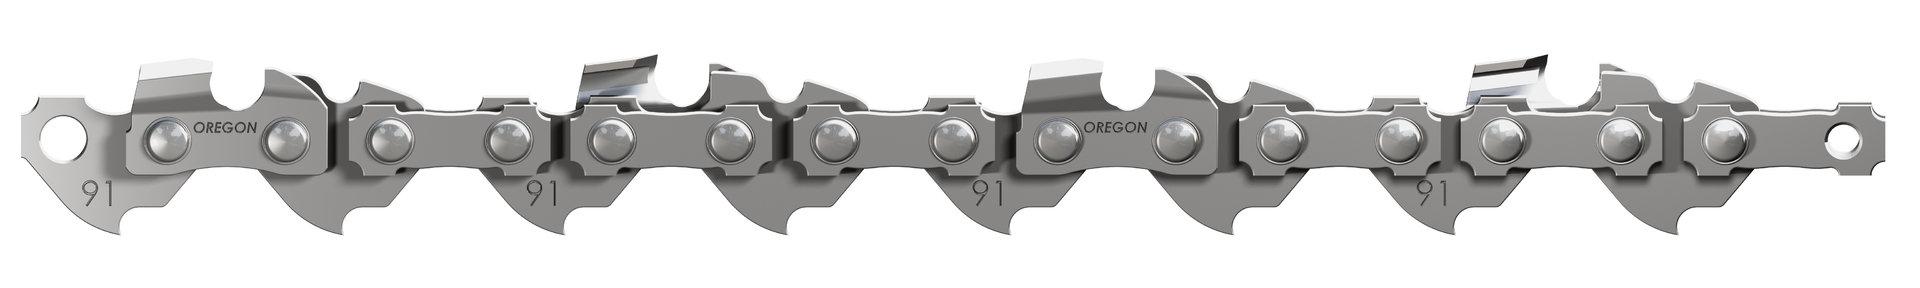 "2 Stück OREGON Sägeketten 91VXL 3//8/"" 1,3 mm 57 TG 40 cm 91VXL057E"